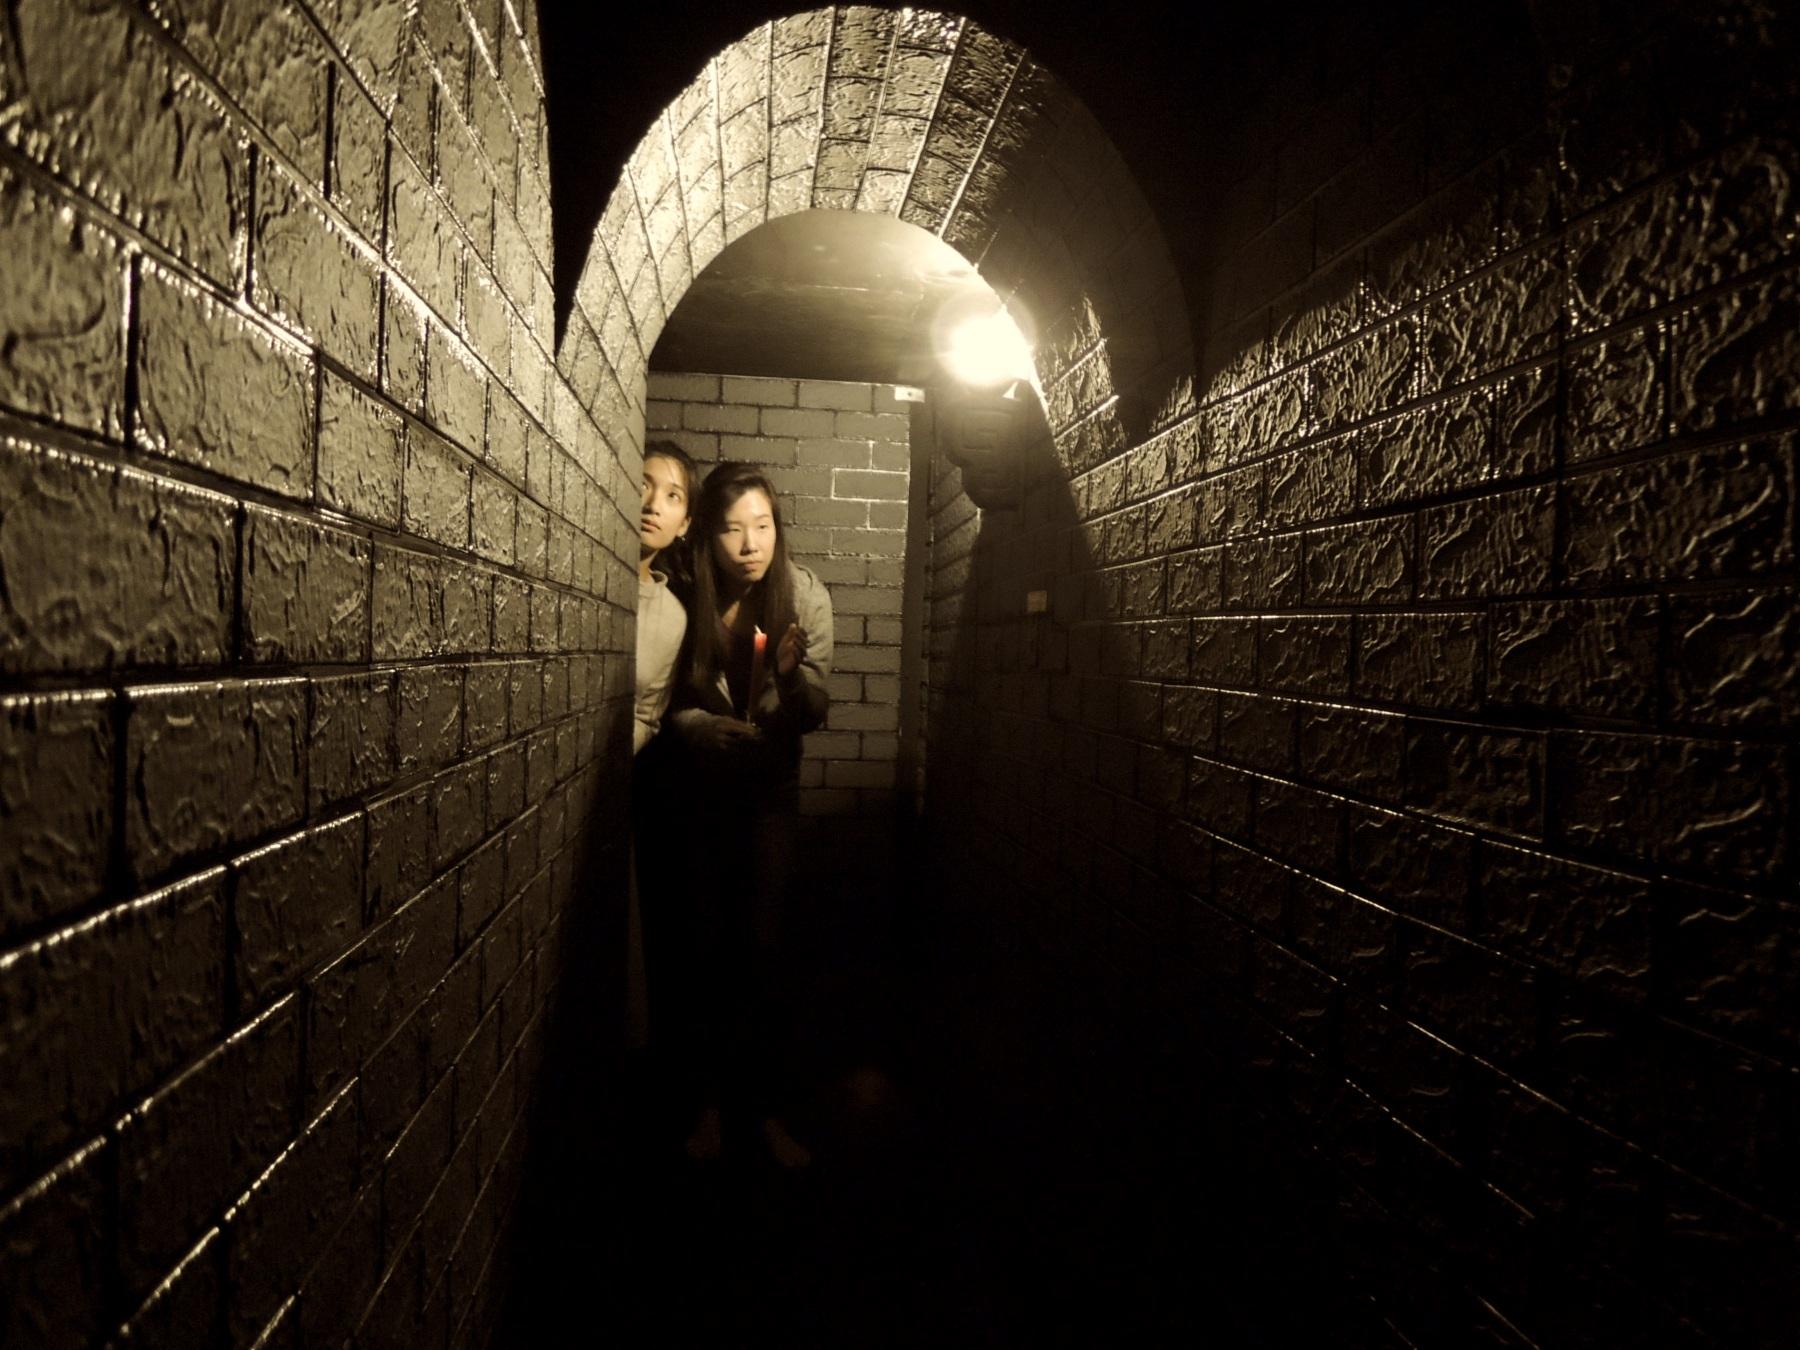 【LoGin 密室逃脫評價】等一個人・盜墓無雷體驗分享,完美沉浸式遊戲感受